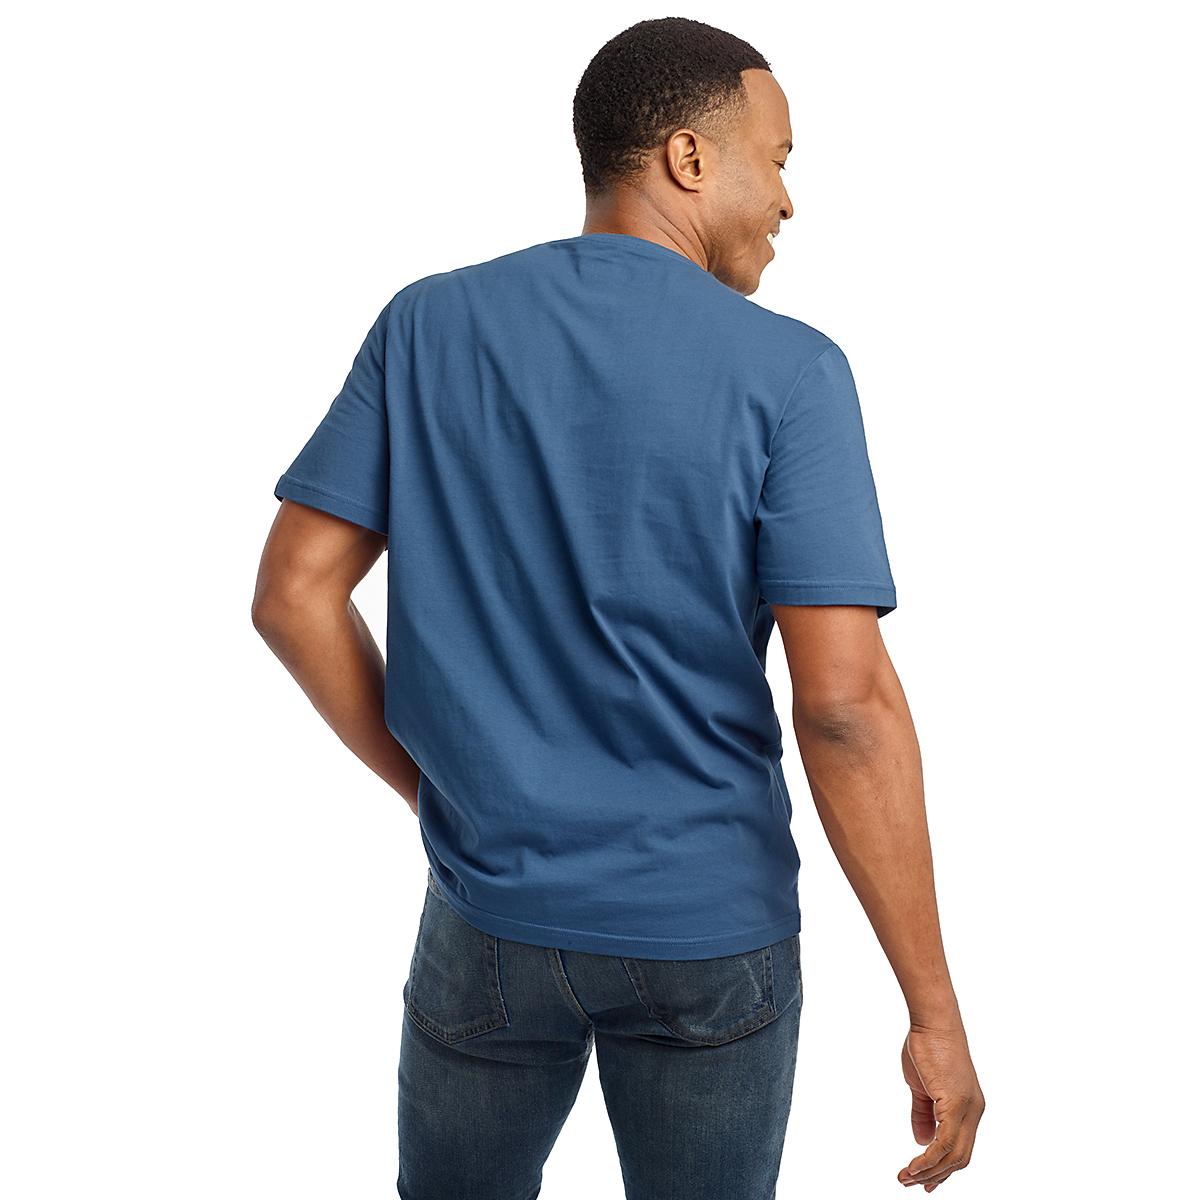 Men's Saucony Rested Short Sleeve Tee - Color: Ensign Blue - Size: S, Ensign Blue, large, image 2